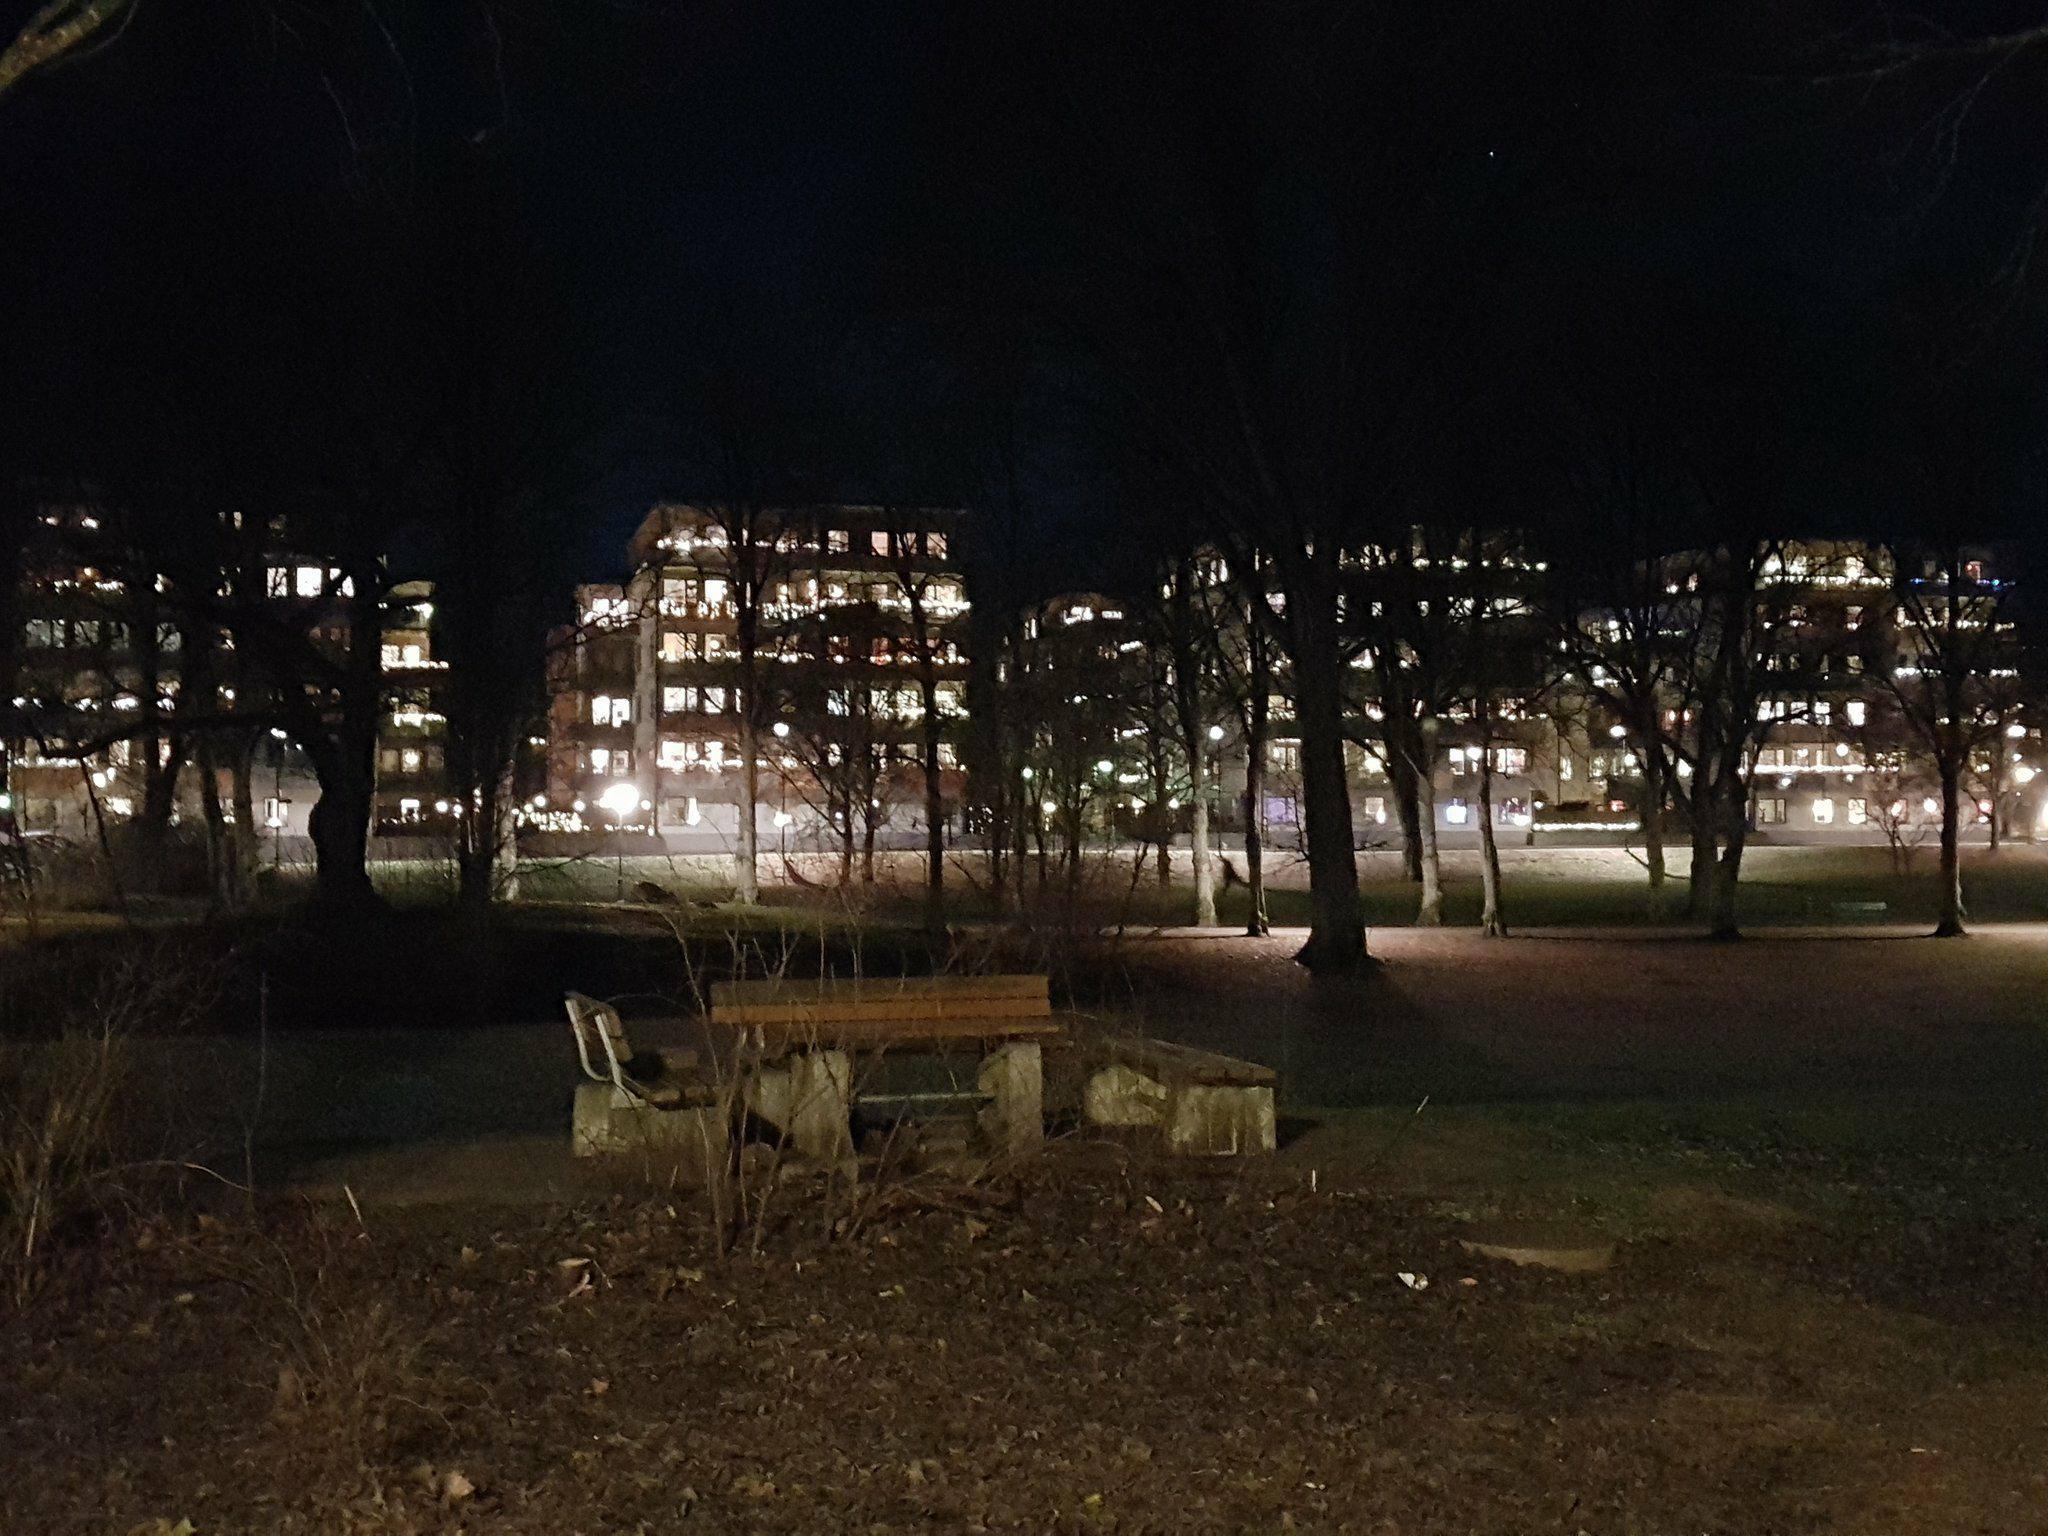 171204 Långbro park